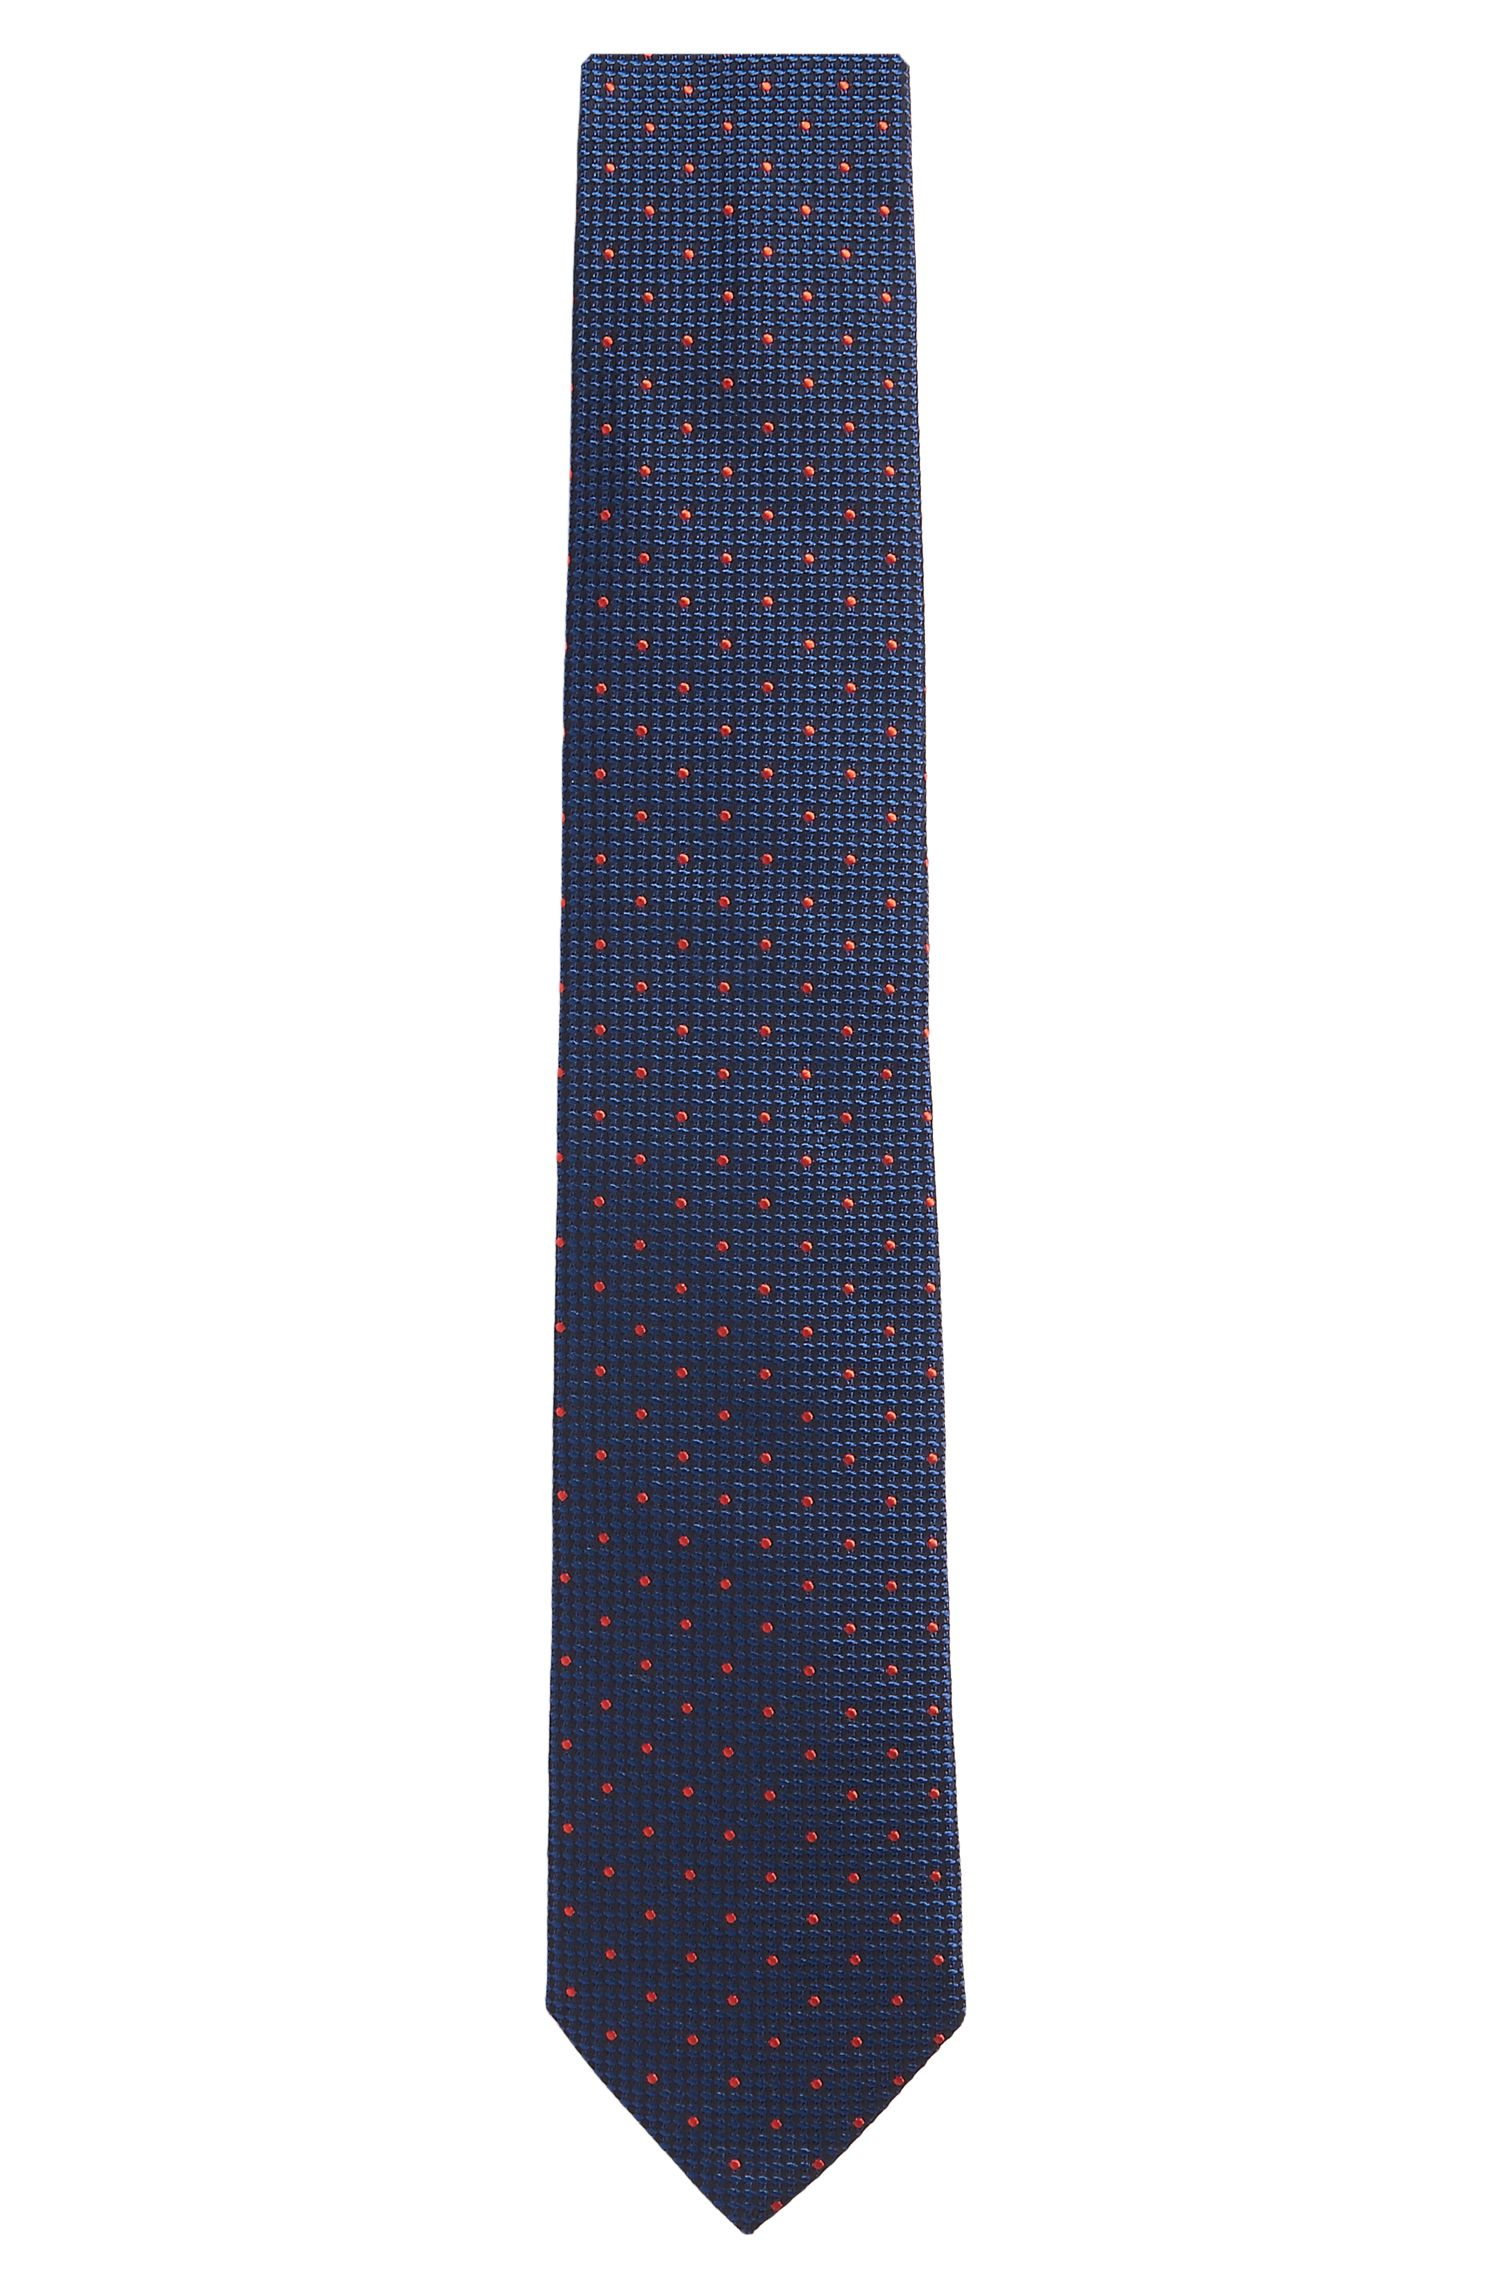 'Tie 7.5 cm' | Regular, Italian Silk Embroidered Tie